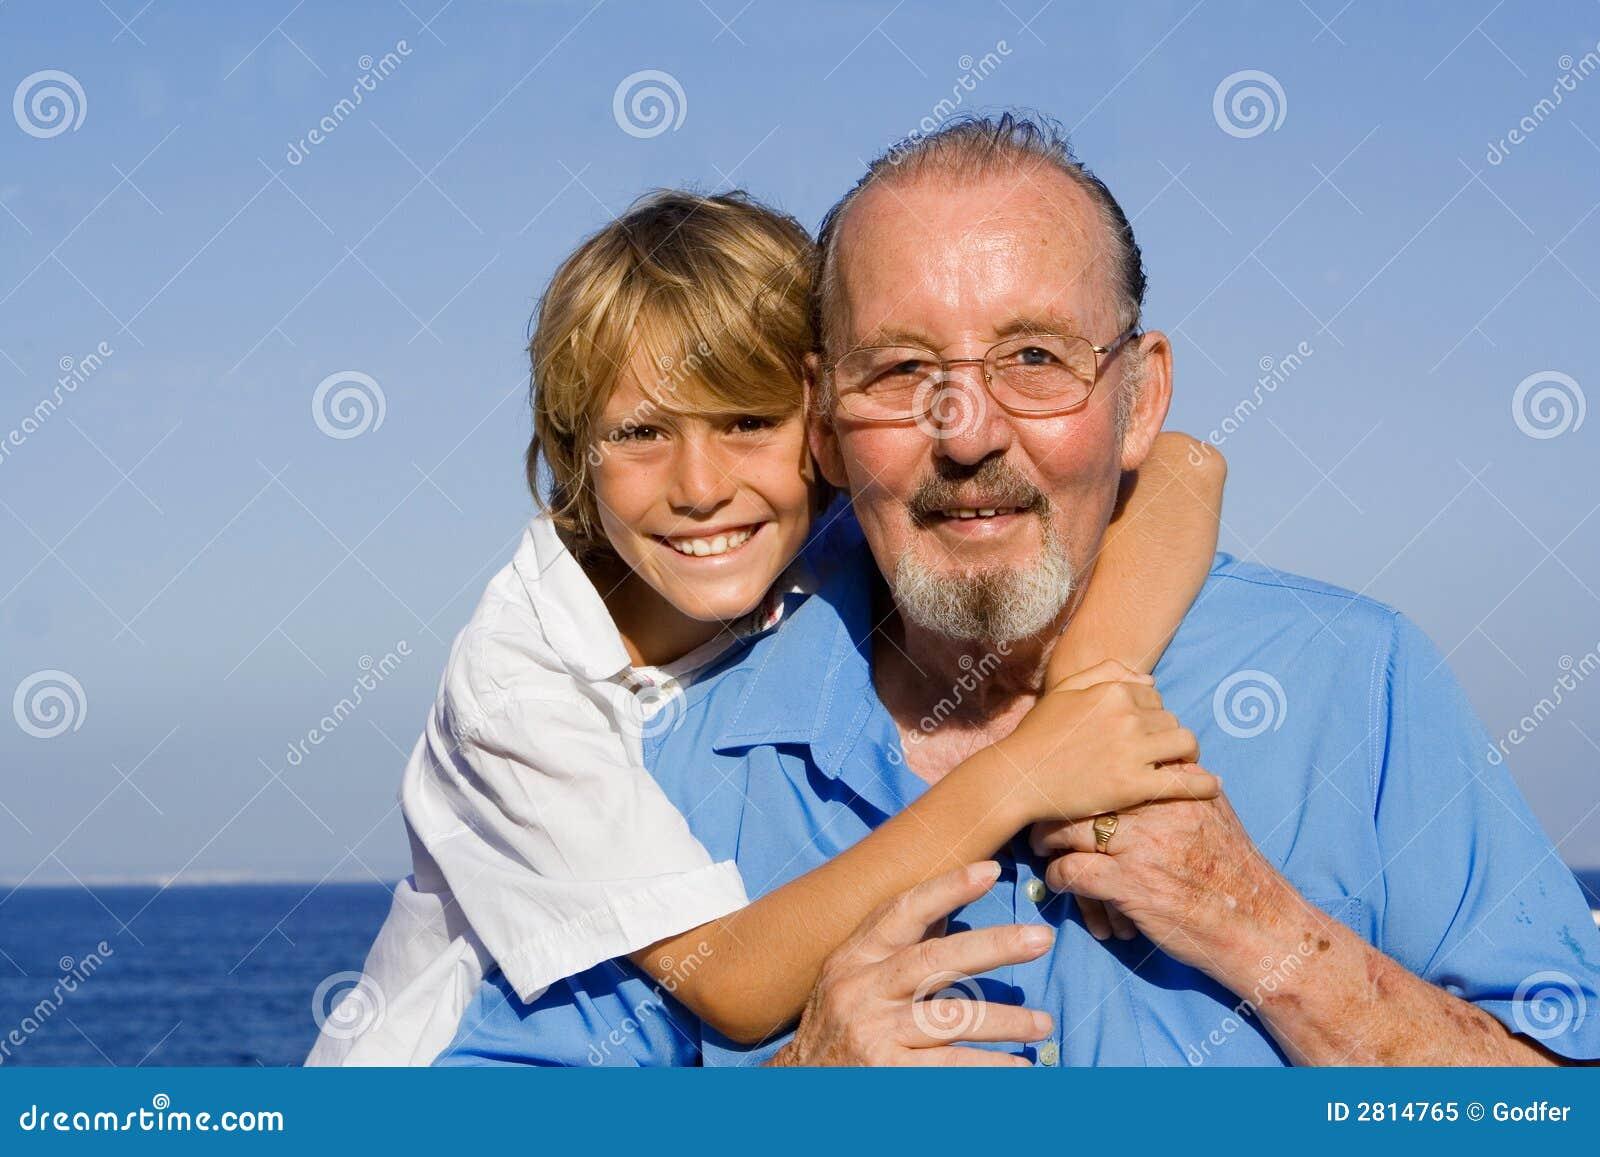 grandfather and grandchild stock image image of glasses 2814765